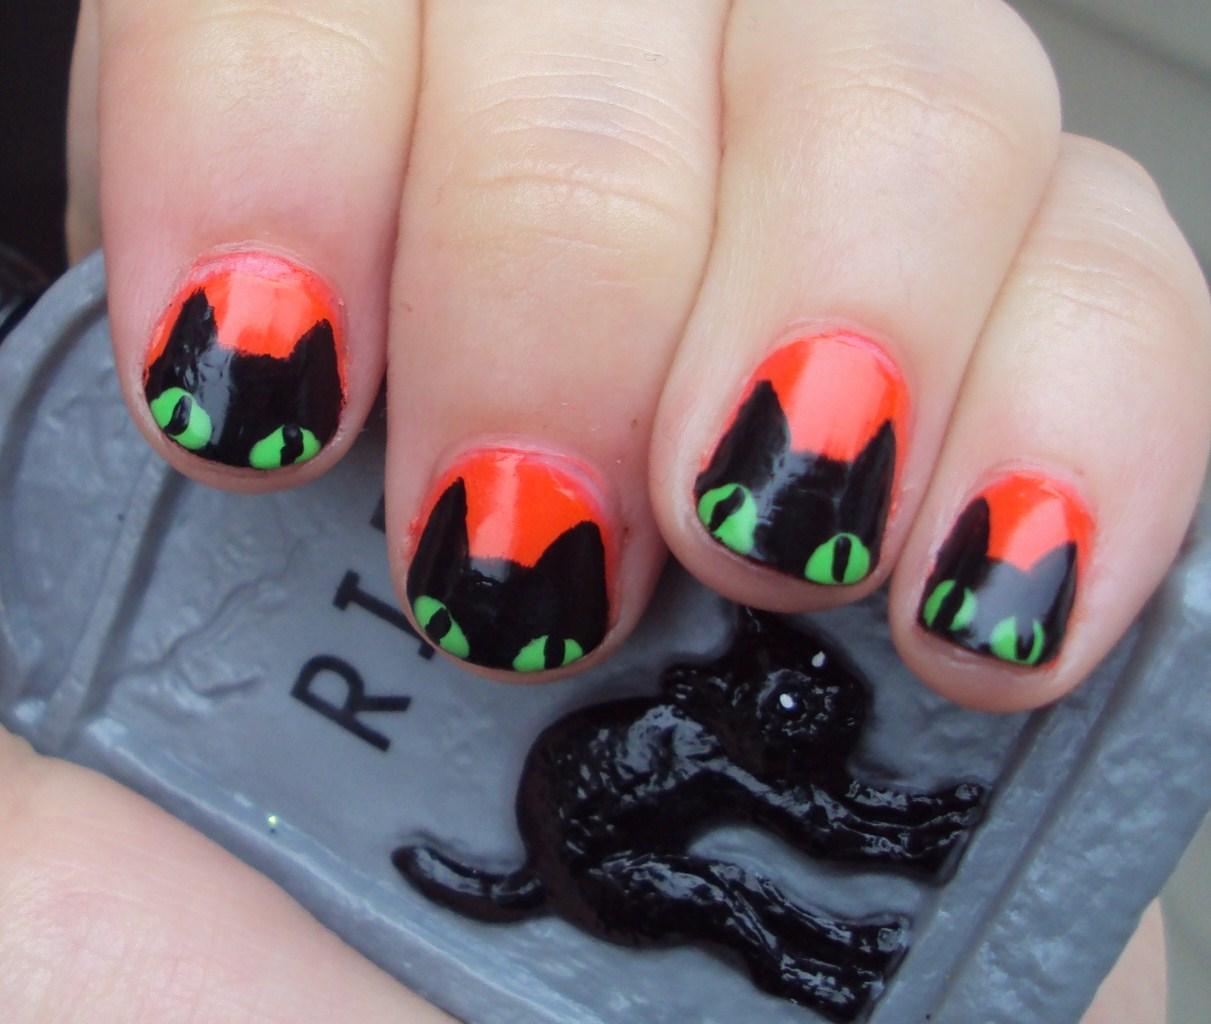 10 Terrifying Black Cat Halloween Fingernail Designs